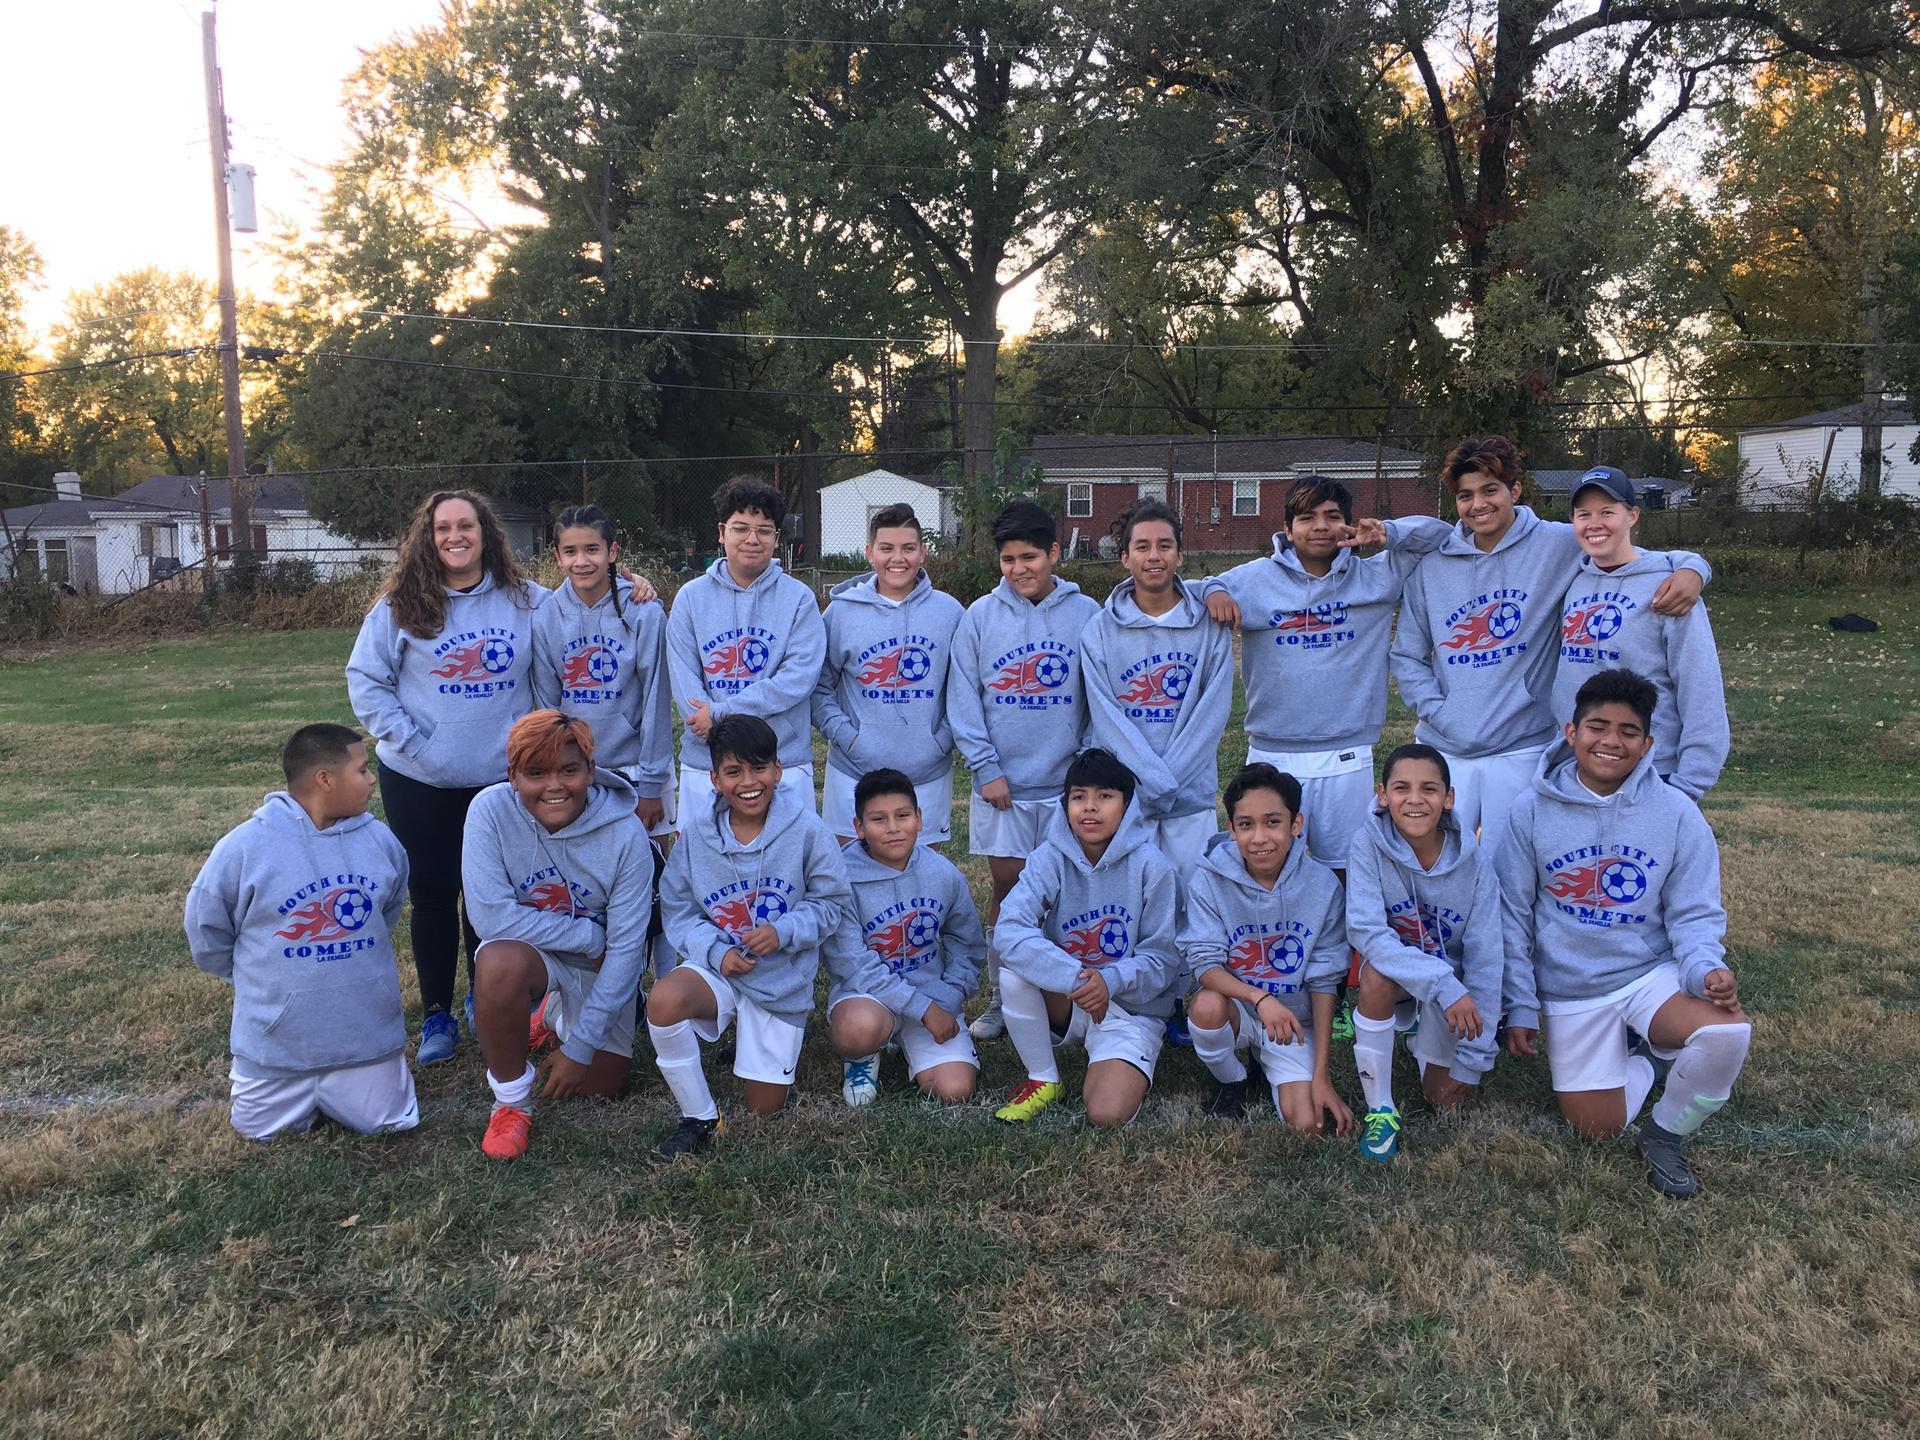 South City Soccer